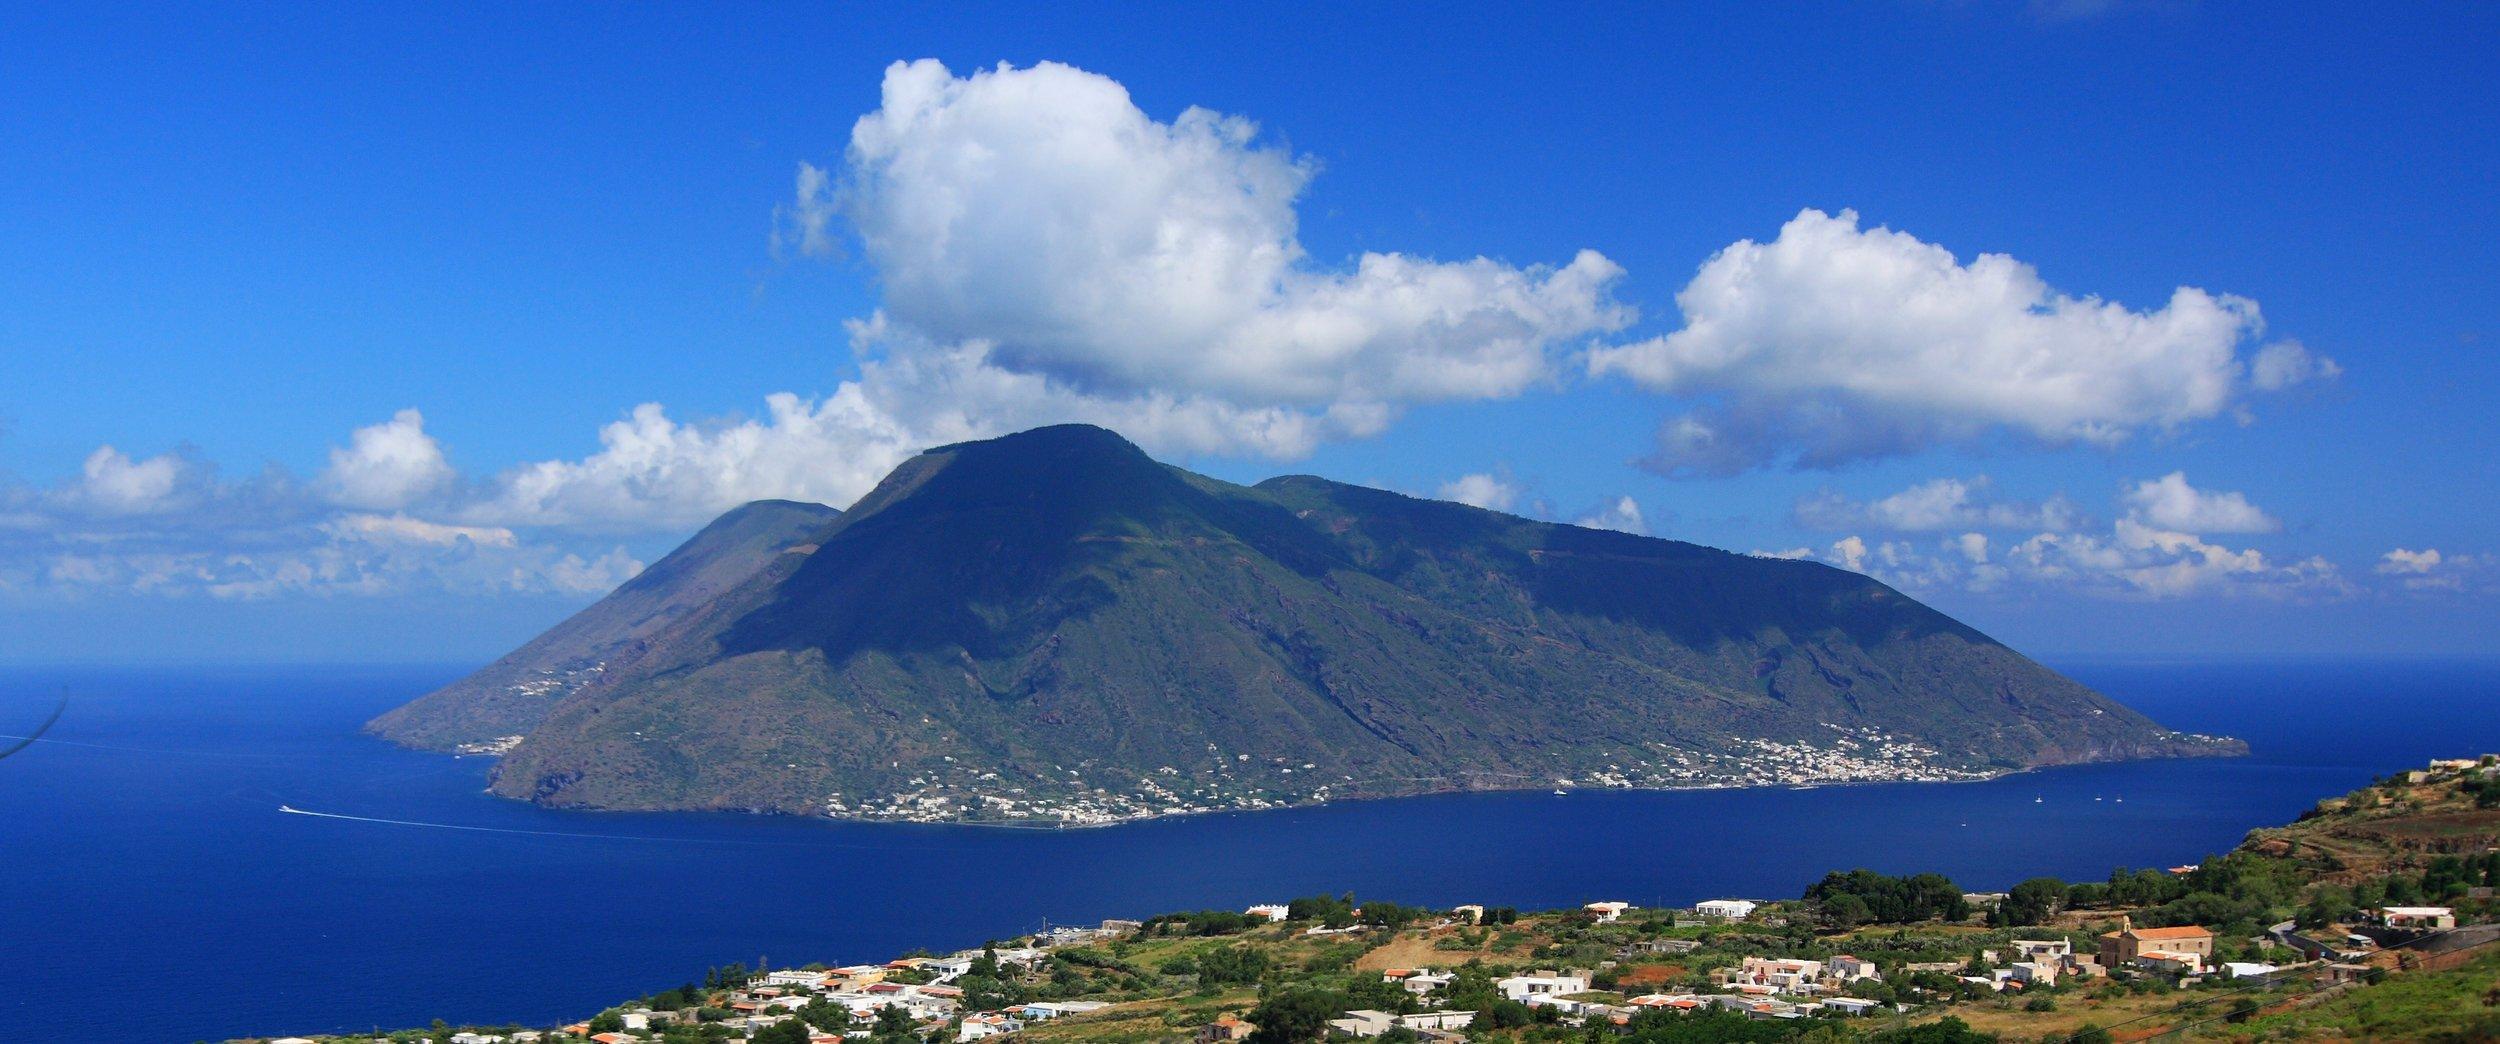 Lisola_di_Salina_Clean_Energy_for_EU_Island